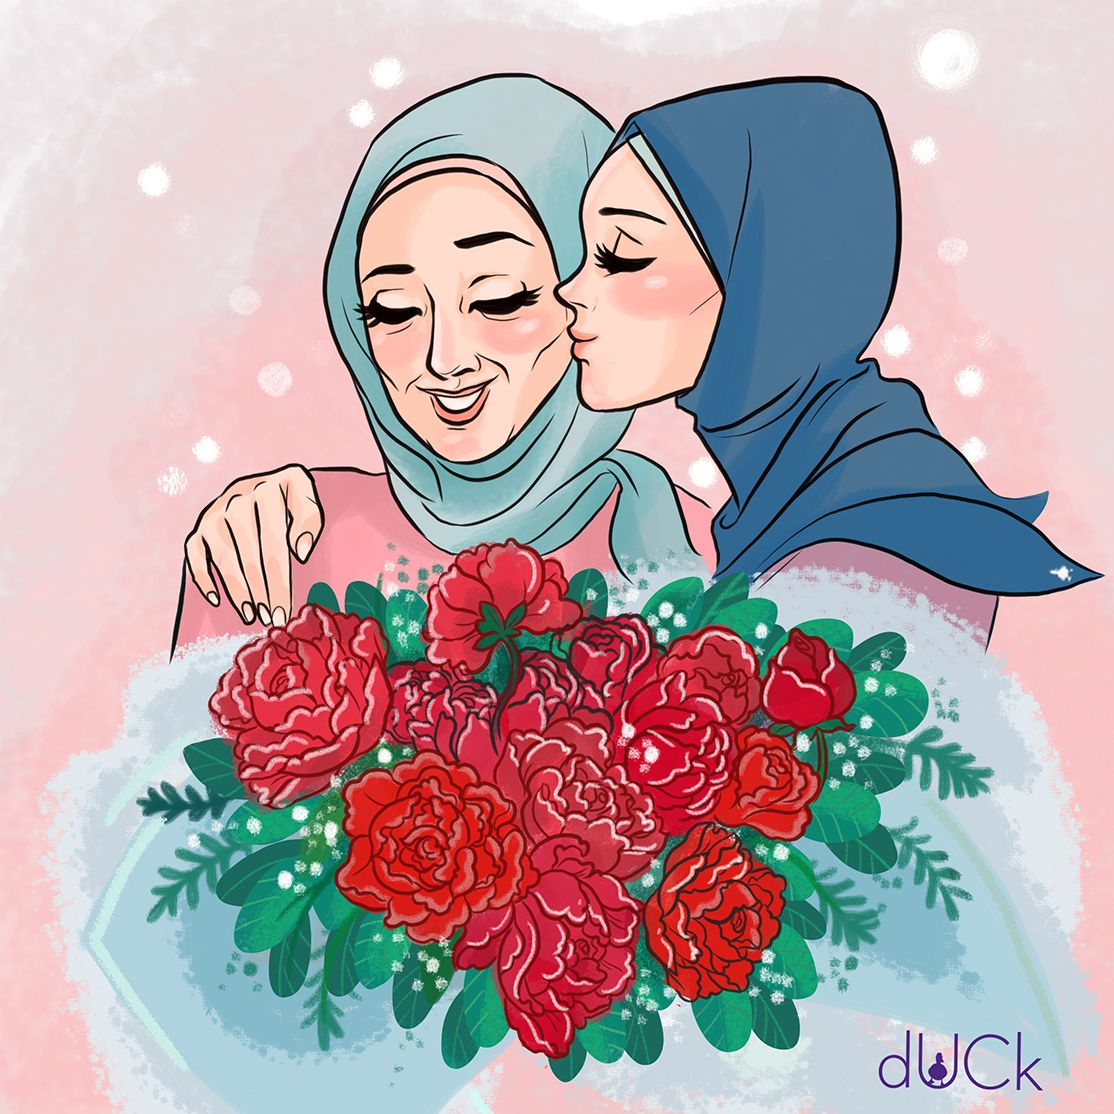 DuckScarves instagram illustration soefara Animasi